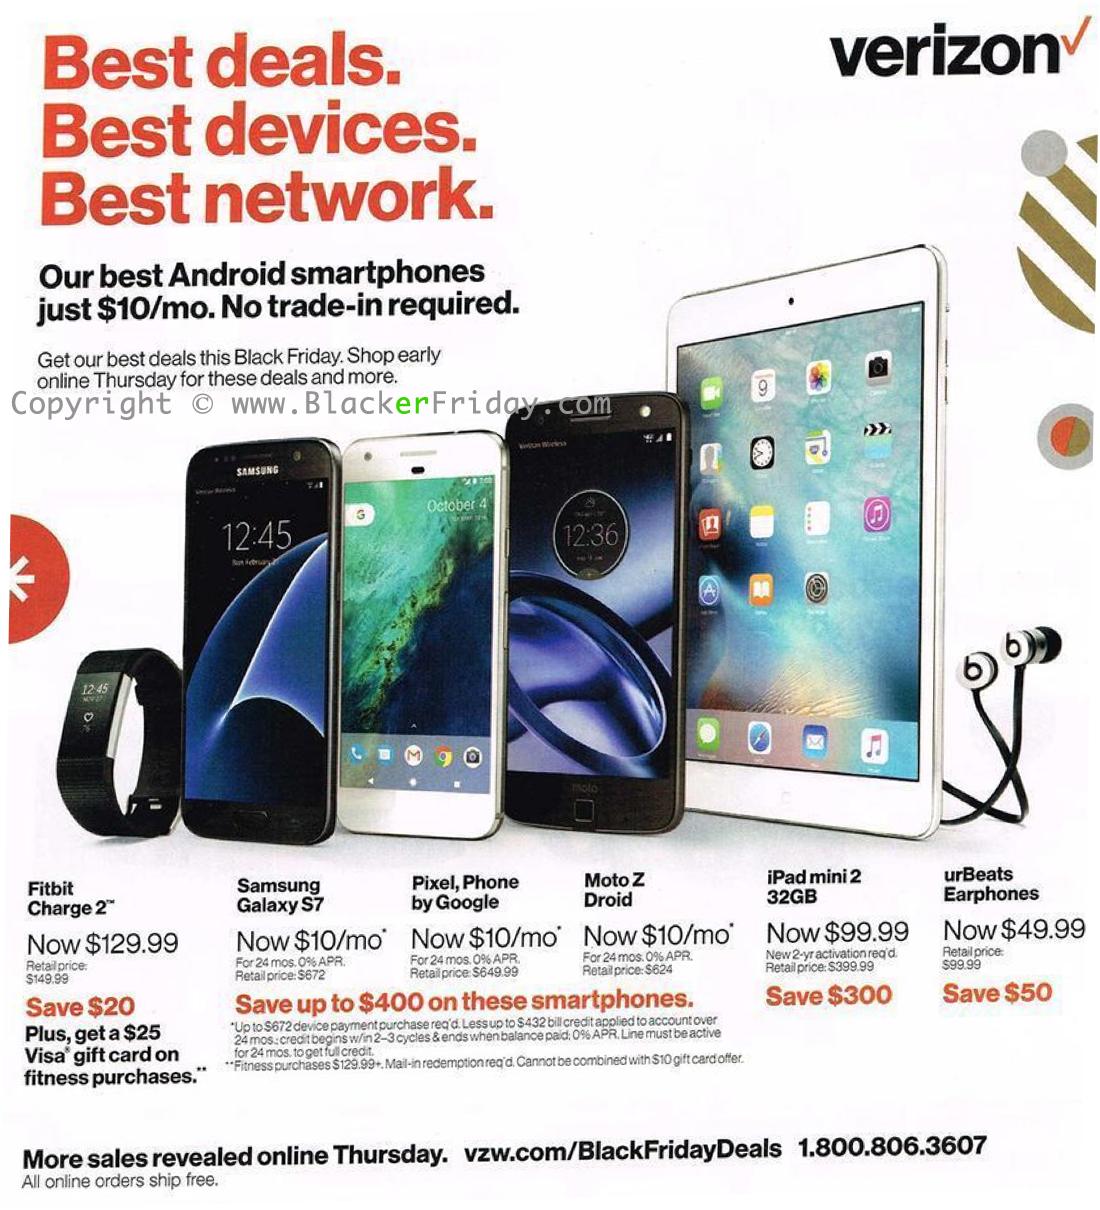 Target Black Friday 2018 Ad >> Verizon Wireless Black Friday Sale 2018 - Blacker Friday